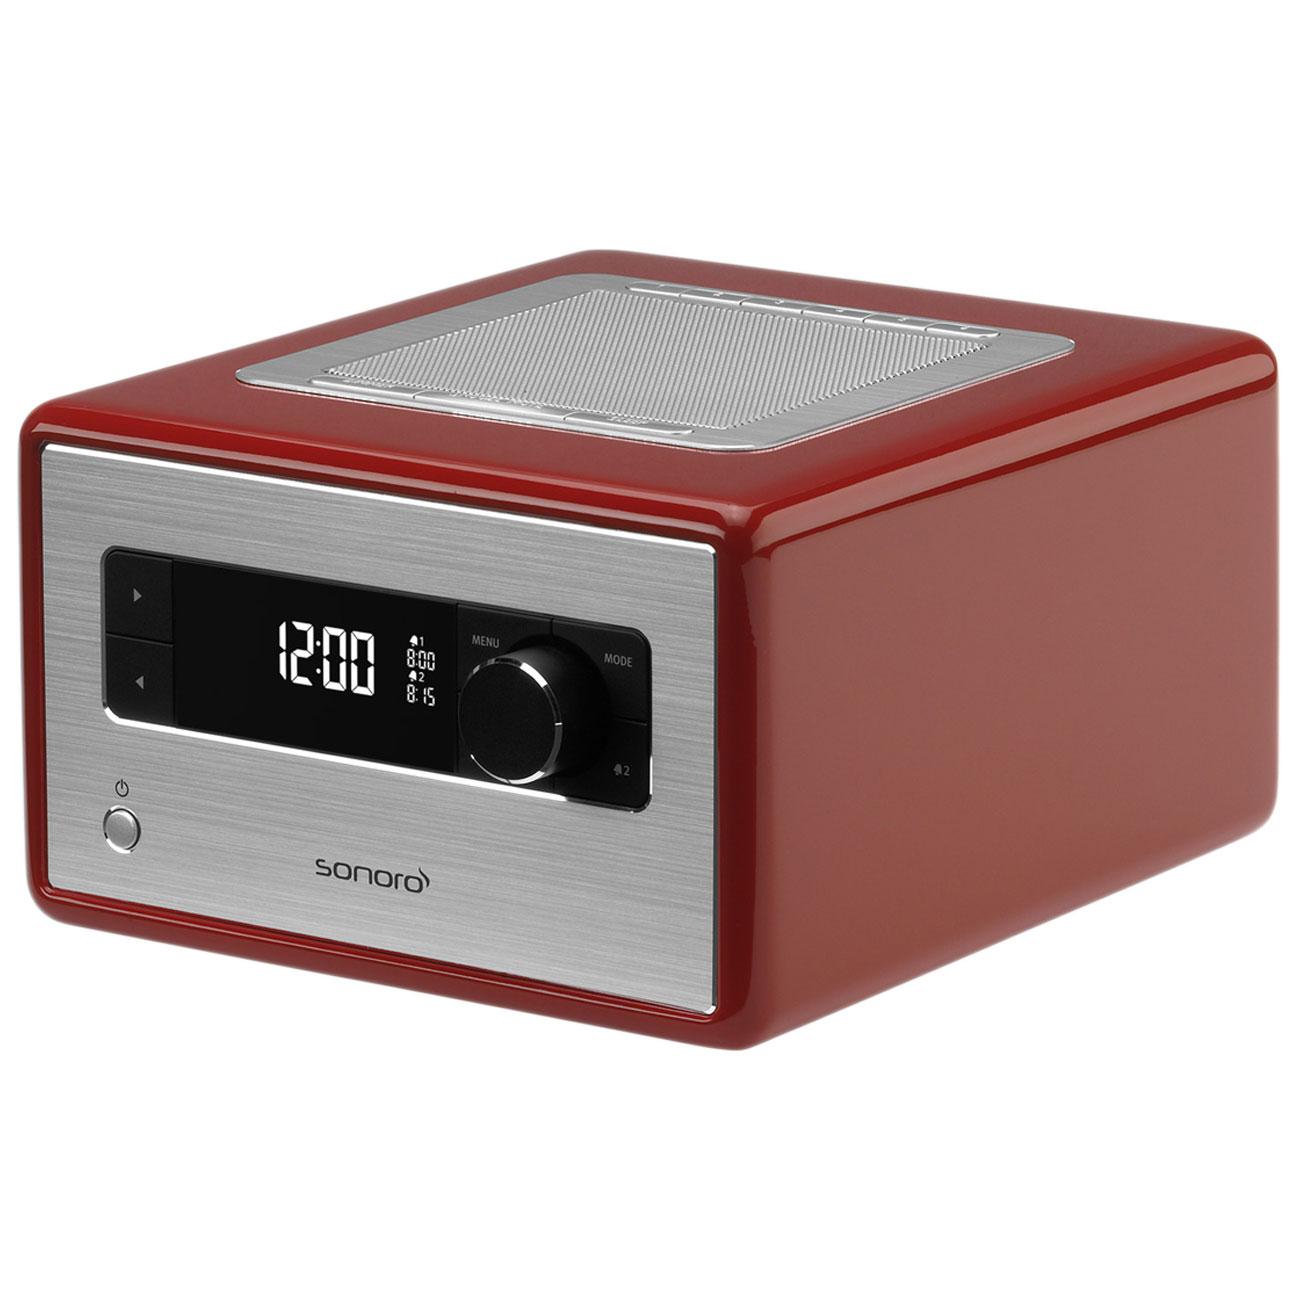 sonoro radio rouge radio radio r veil sonoro sur ldlc. Black Bedroom Furniture Sets. Home Design Ideas